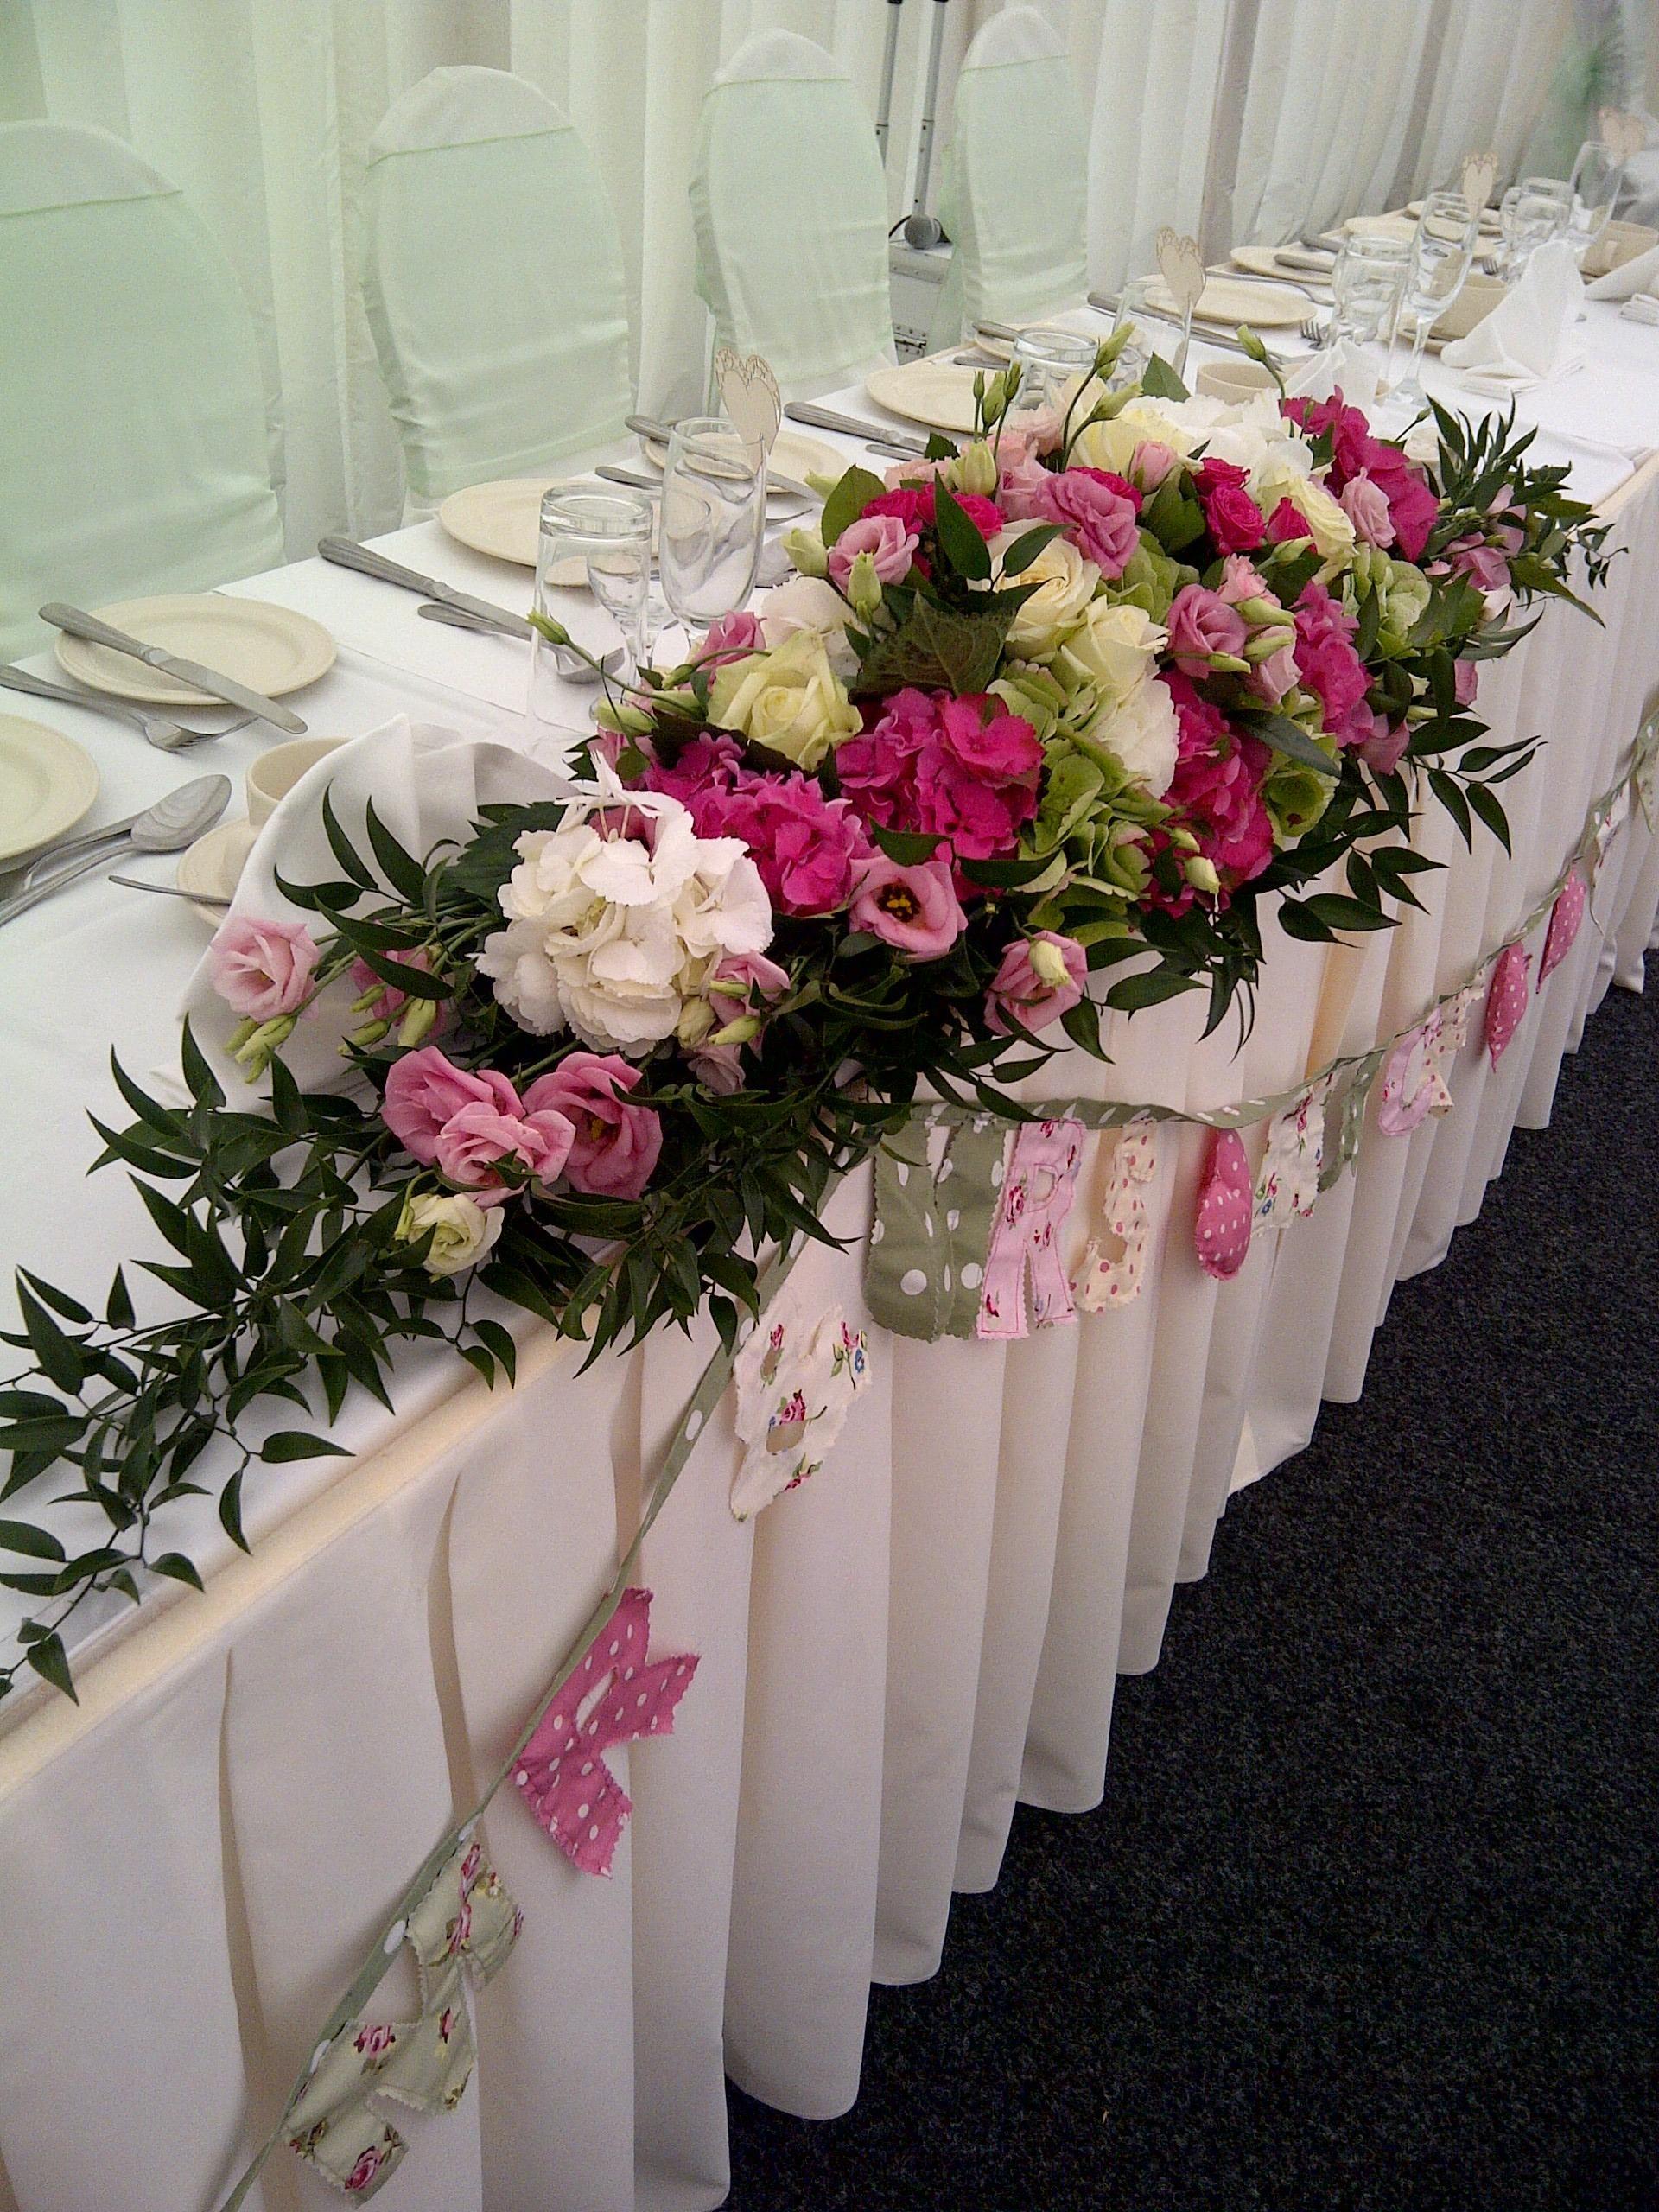 Wedding Table Flower Arrangements | Wedding Flowers Ideas Hillingdon ...